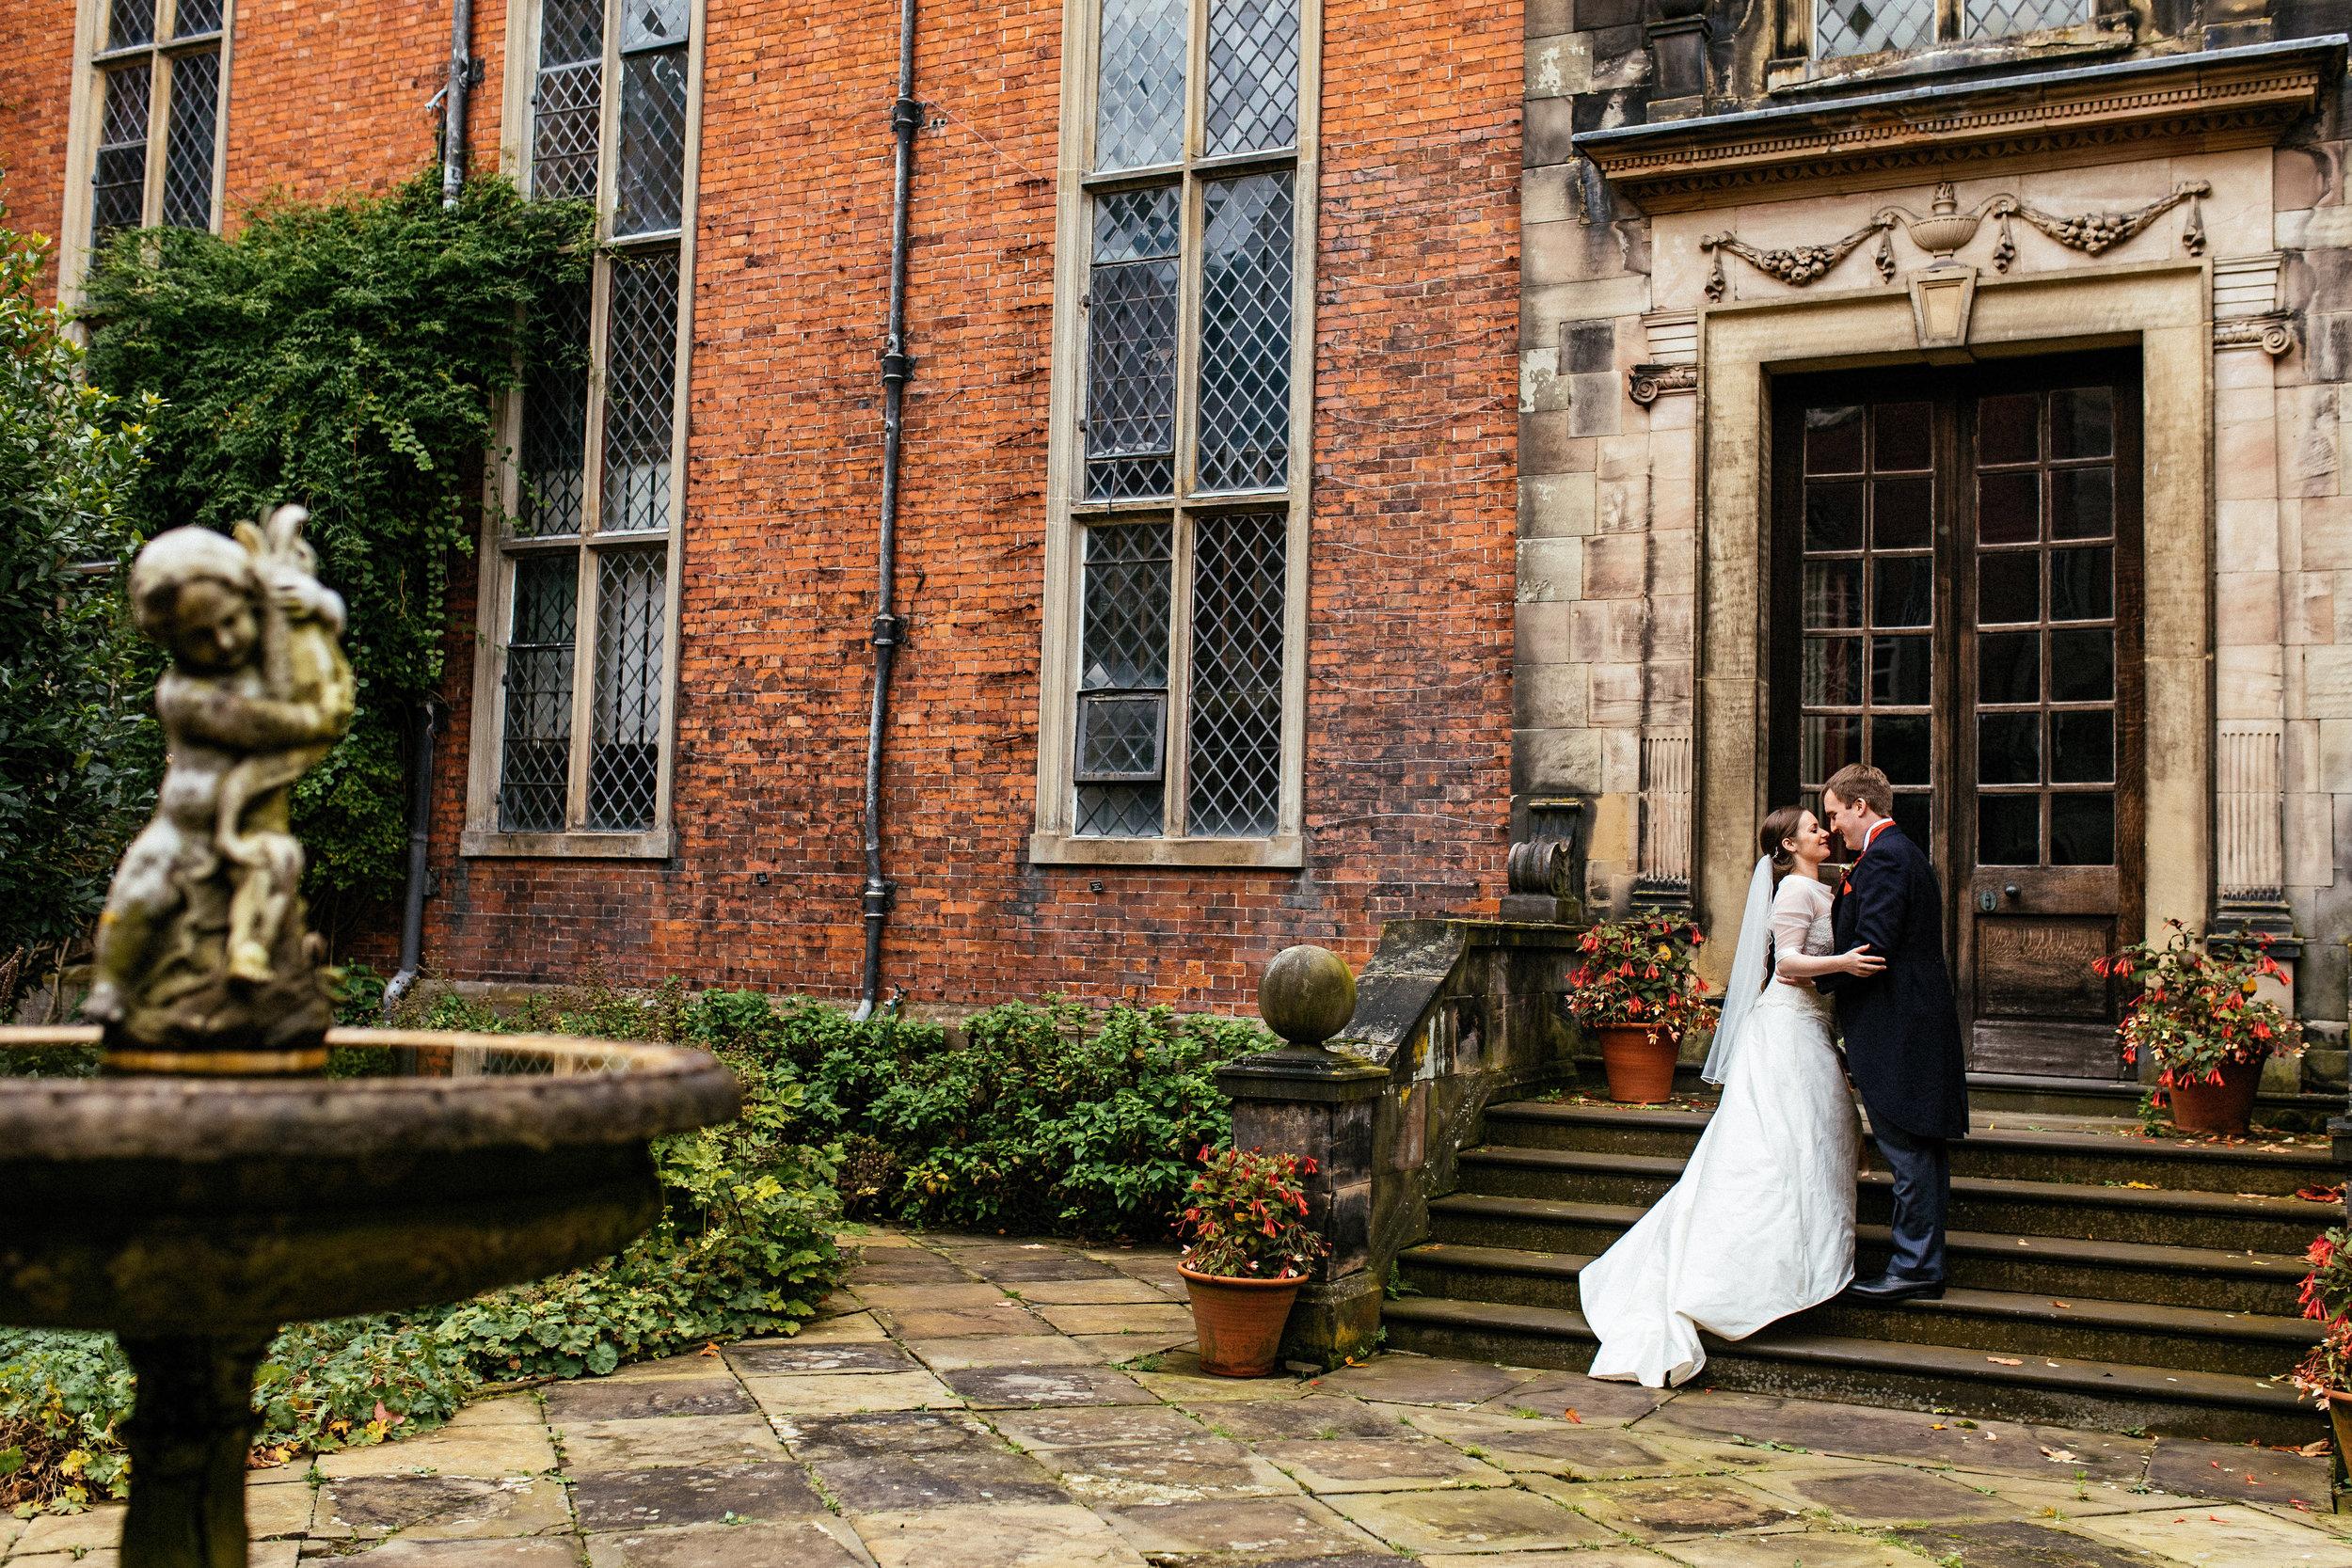 Dunham-Massey-Wedding-Photographer-43.jpg